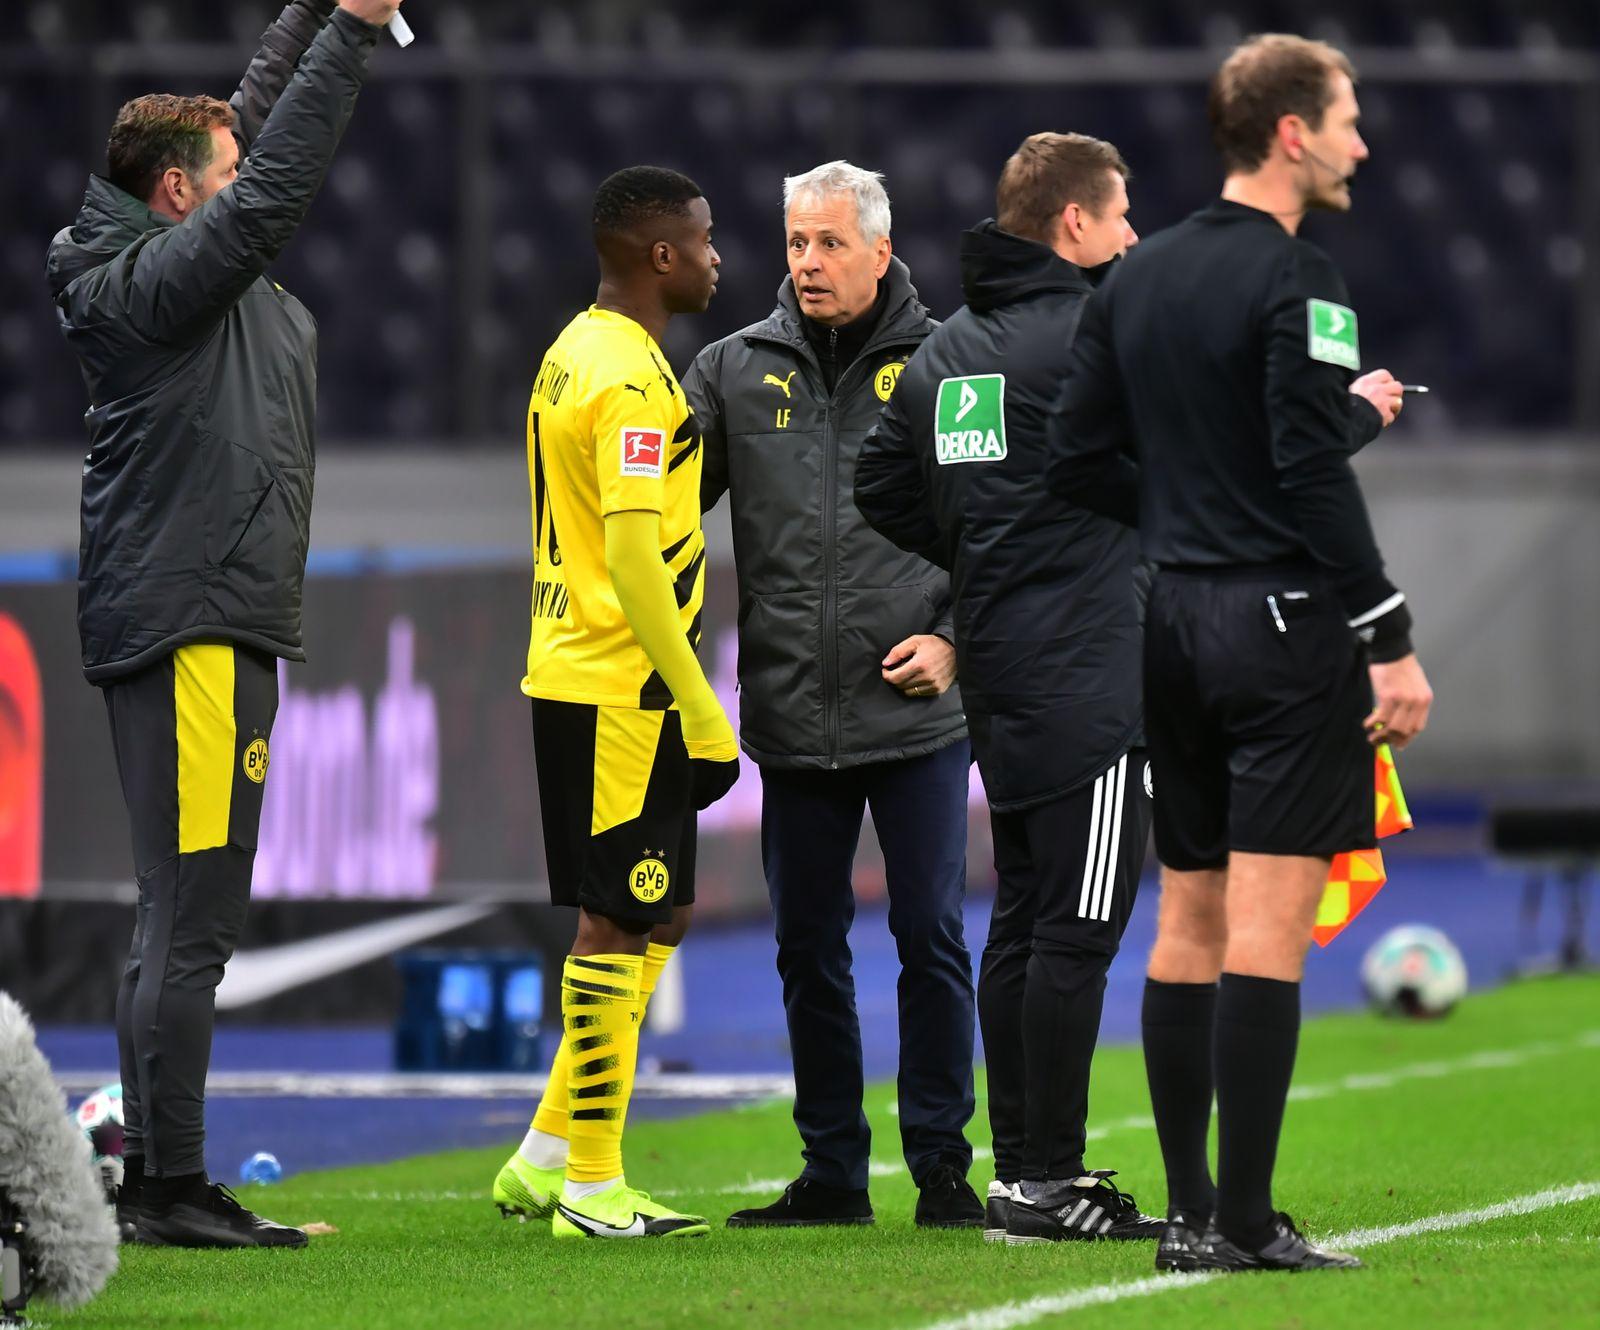 Hertha BSC Berlin vs. Borussia Dortmund, Germany - 21 Nov 2020